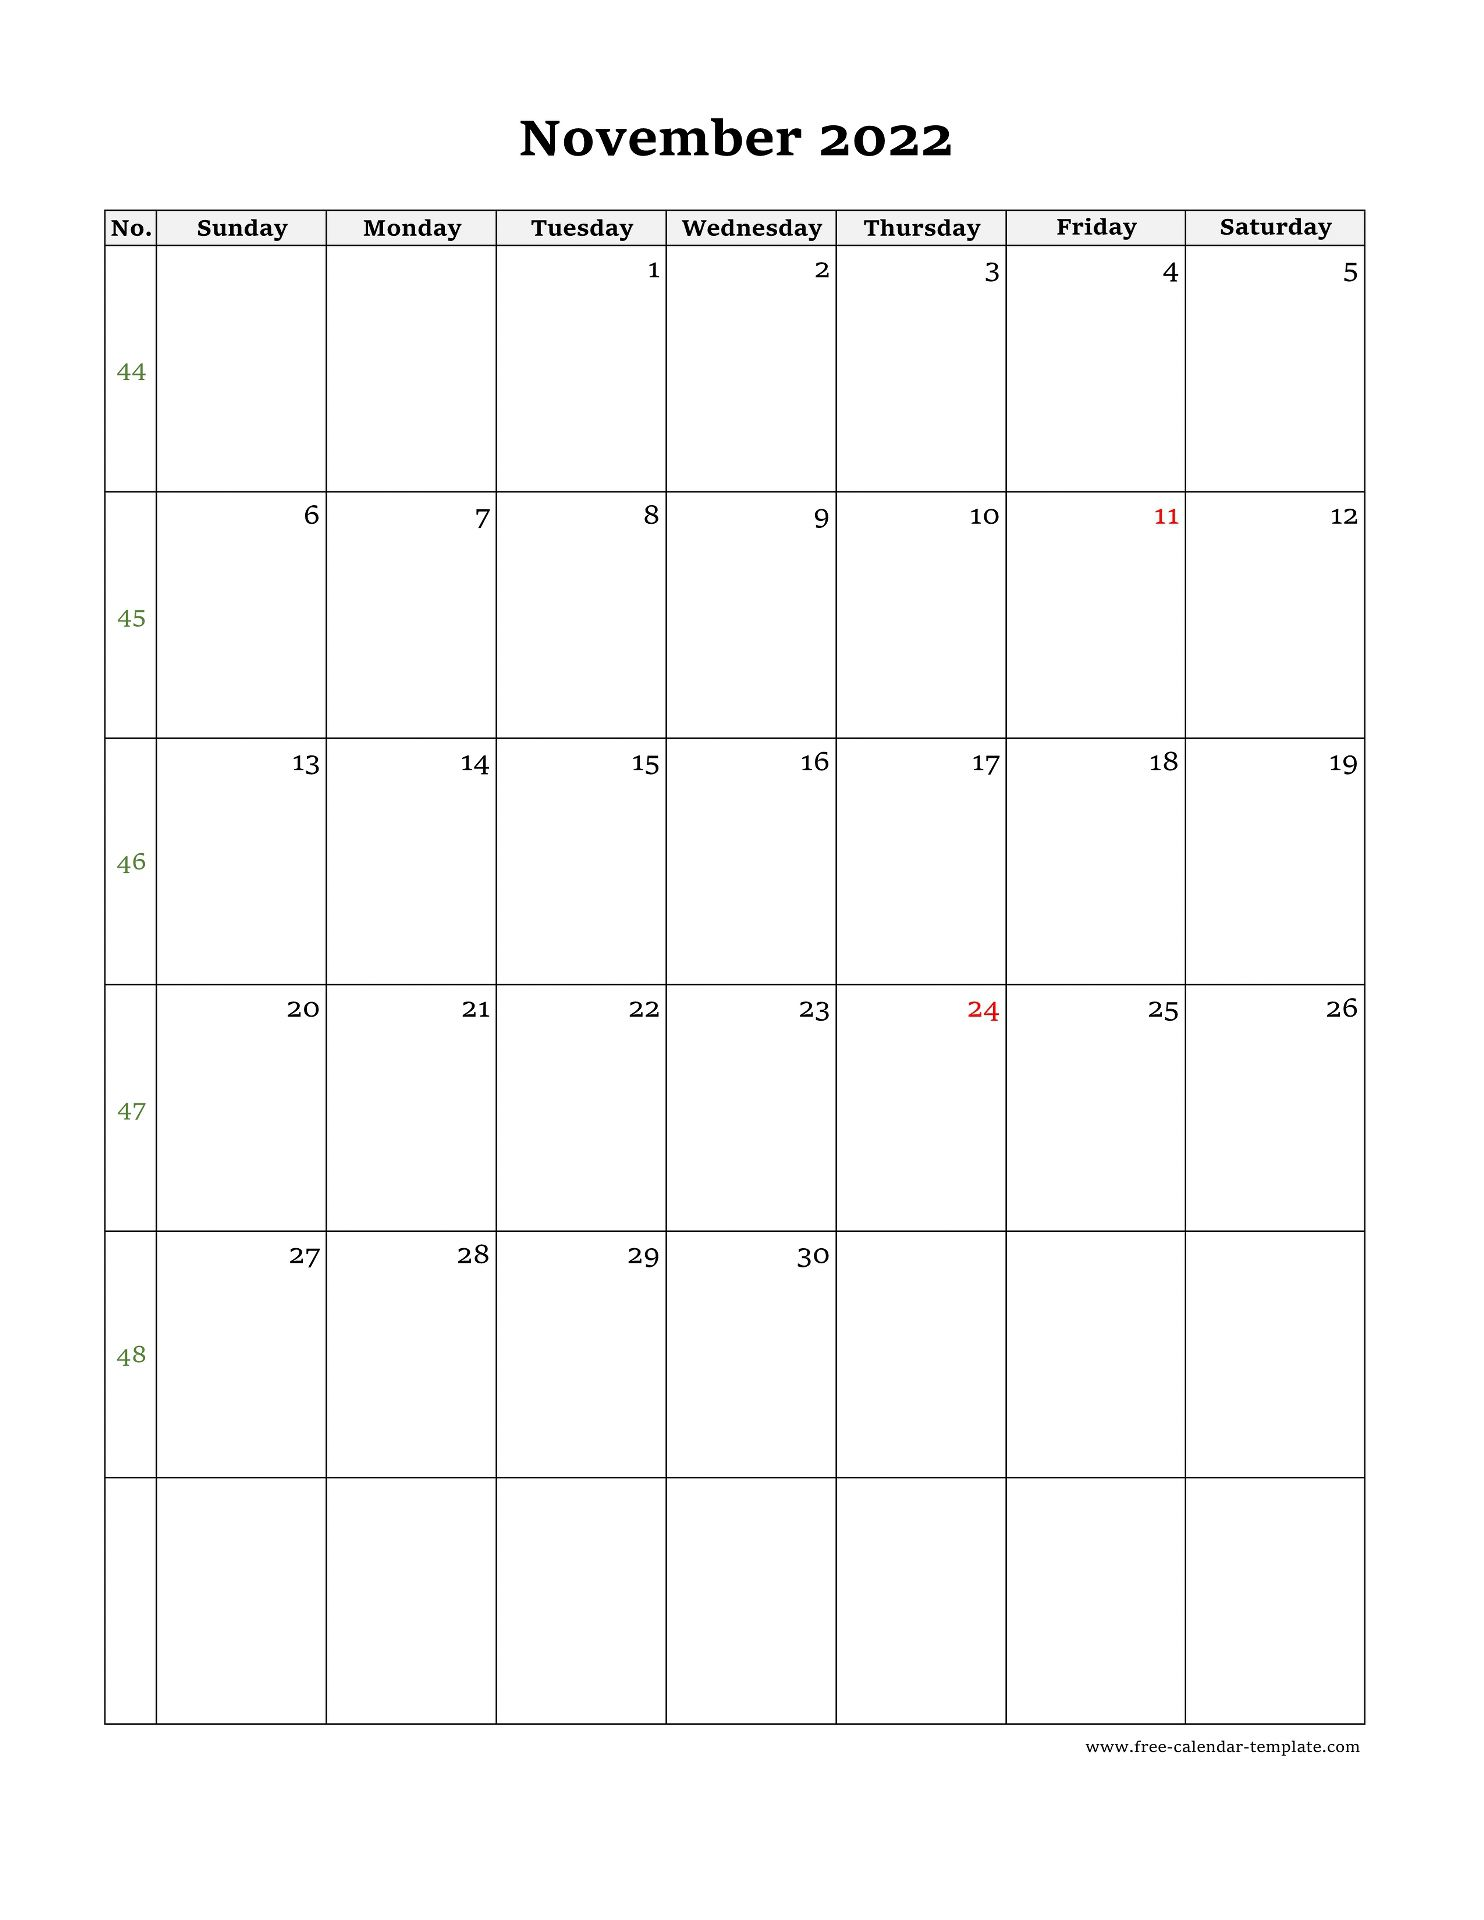 November 2022 Free Calendar Tempplate | Free-calendar ...